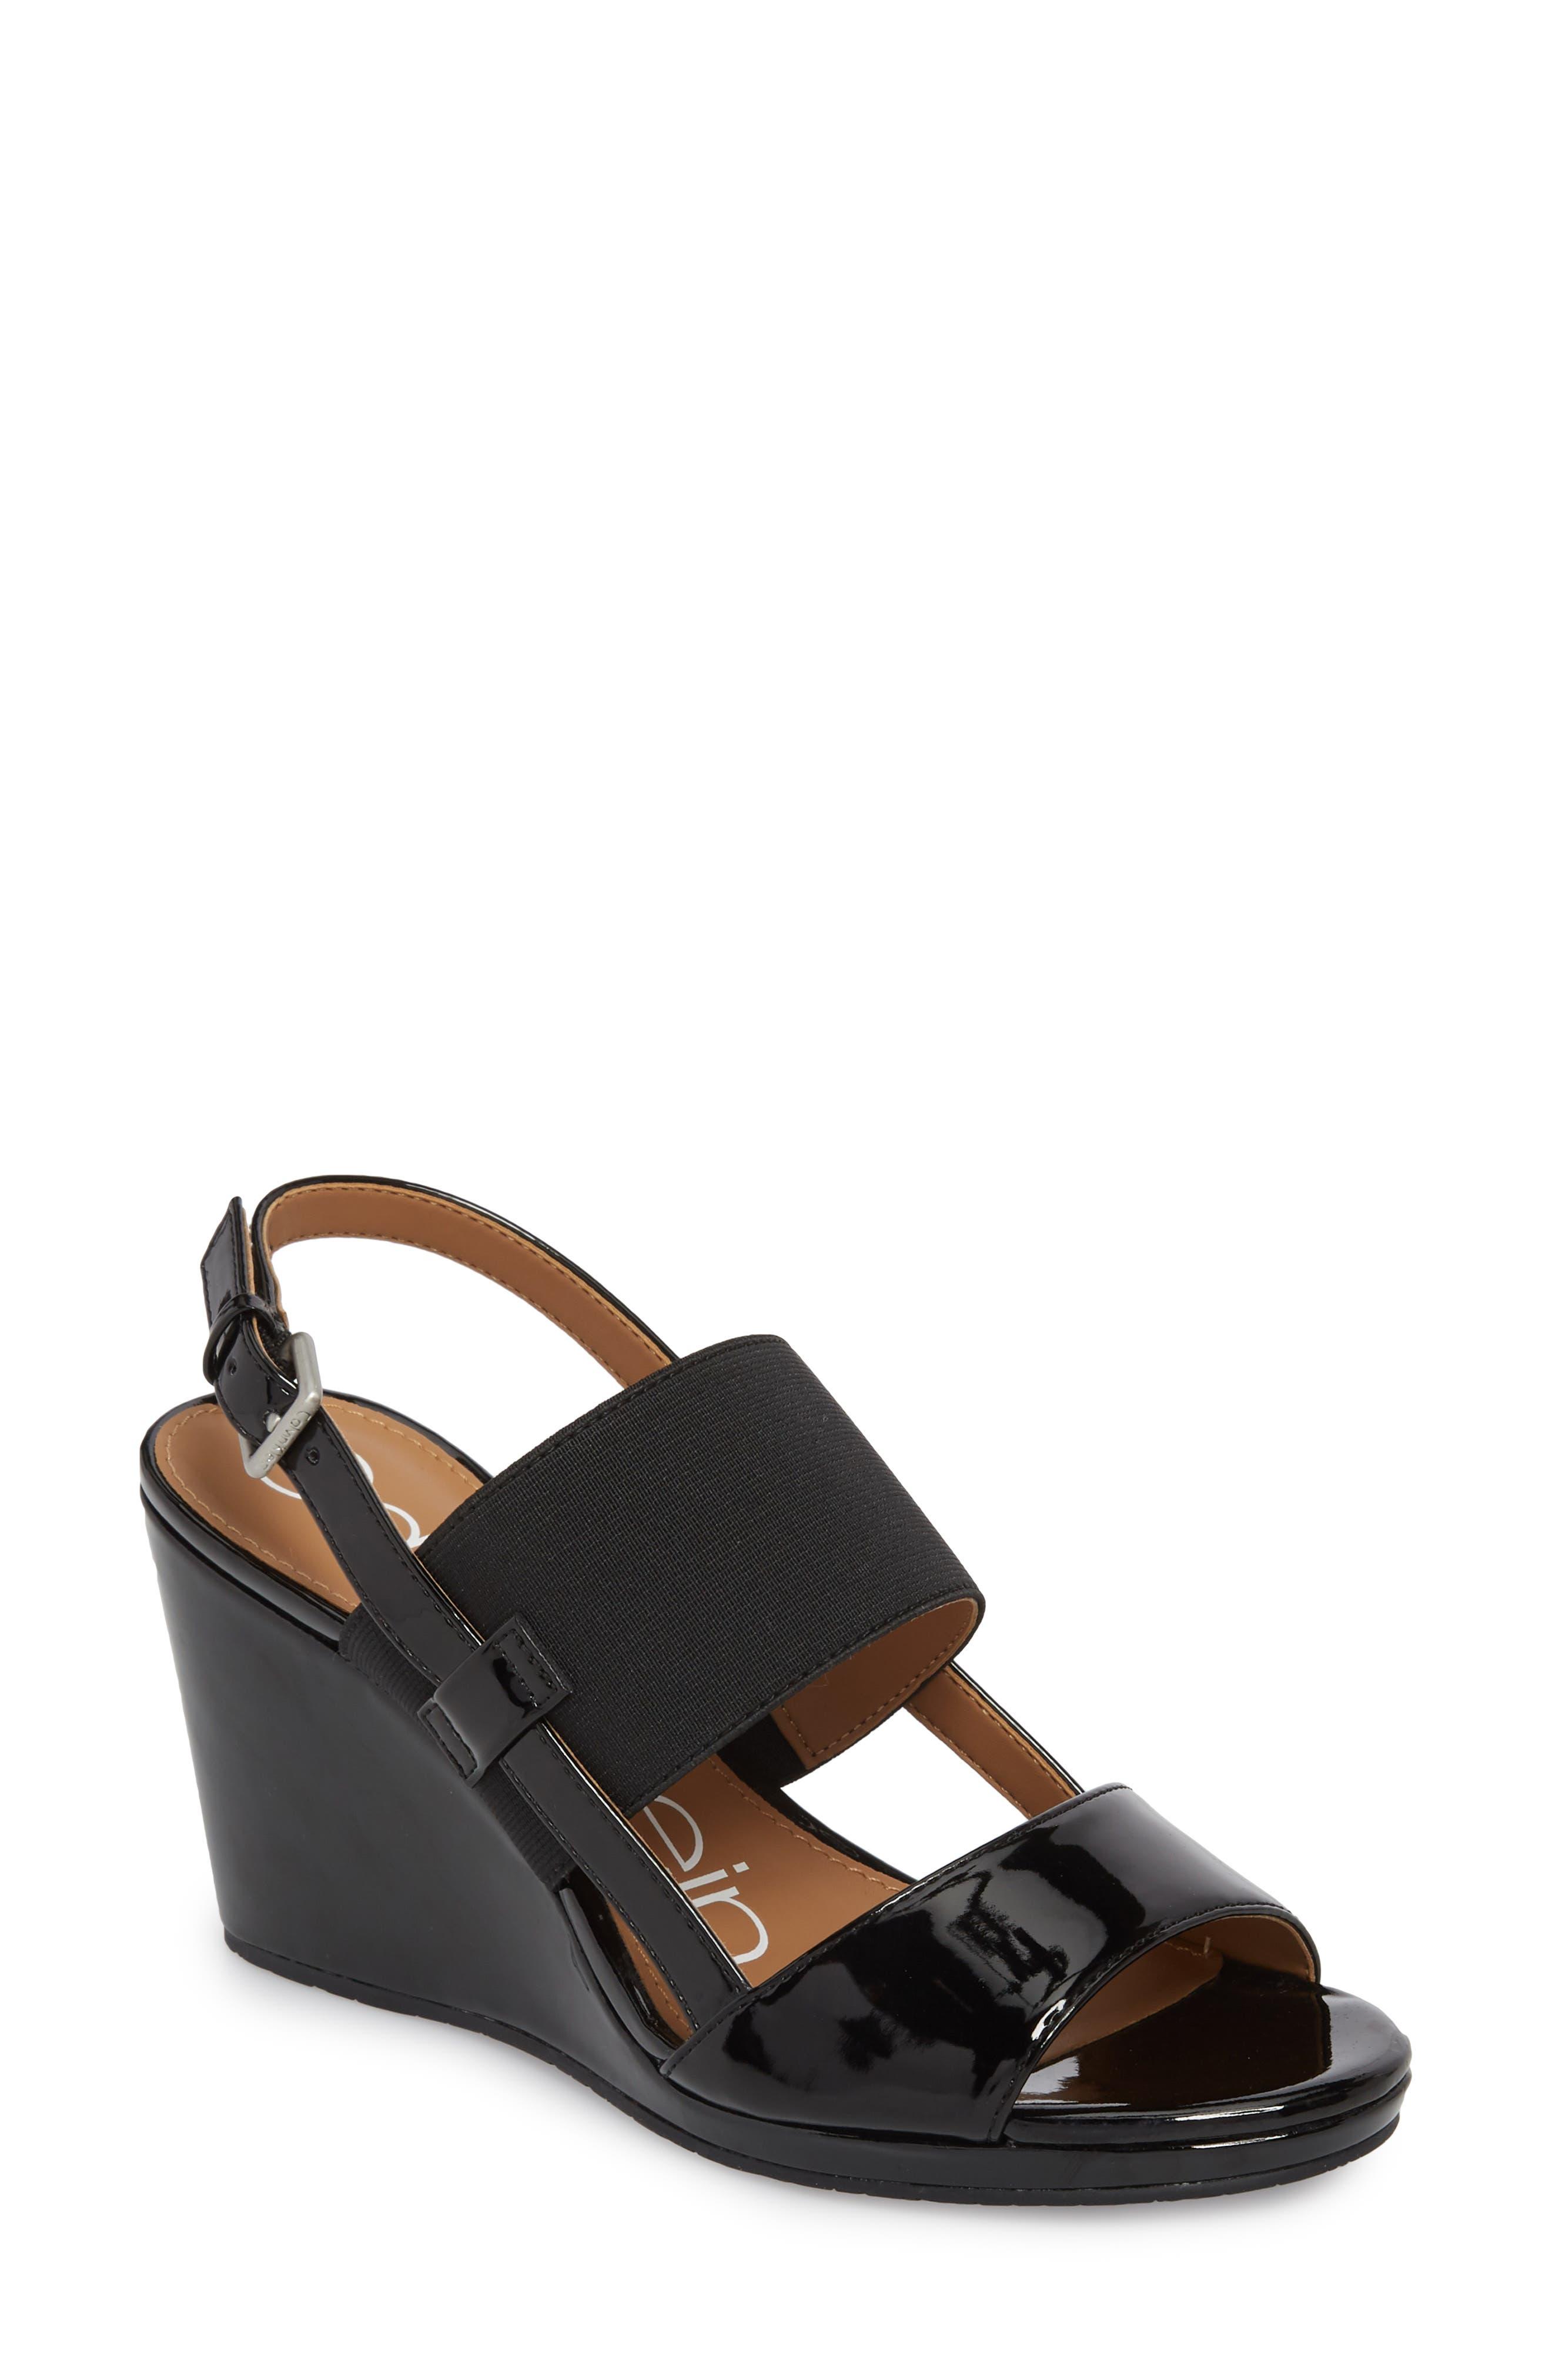 Bethan Wedge Sandal,                         Main,                         color, Black Patent